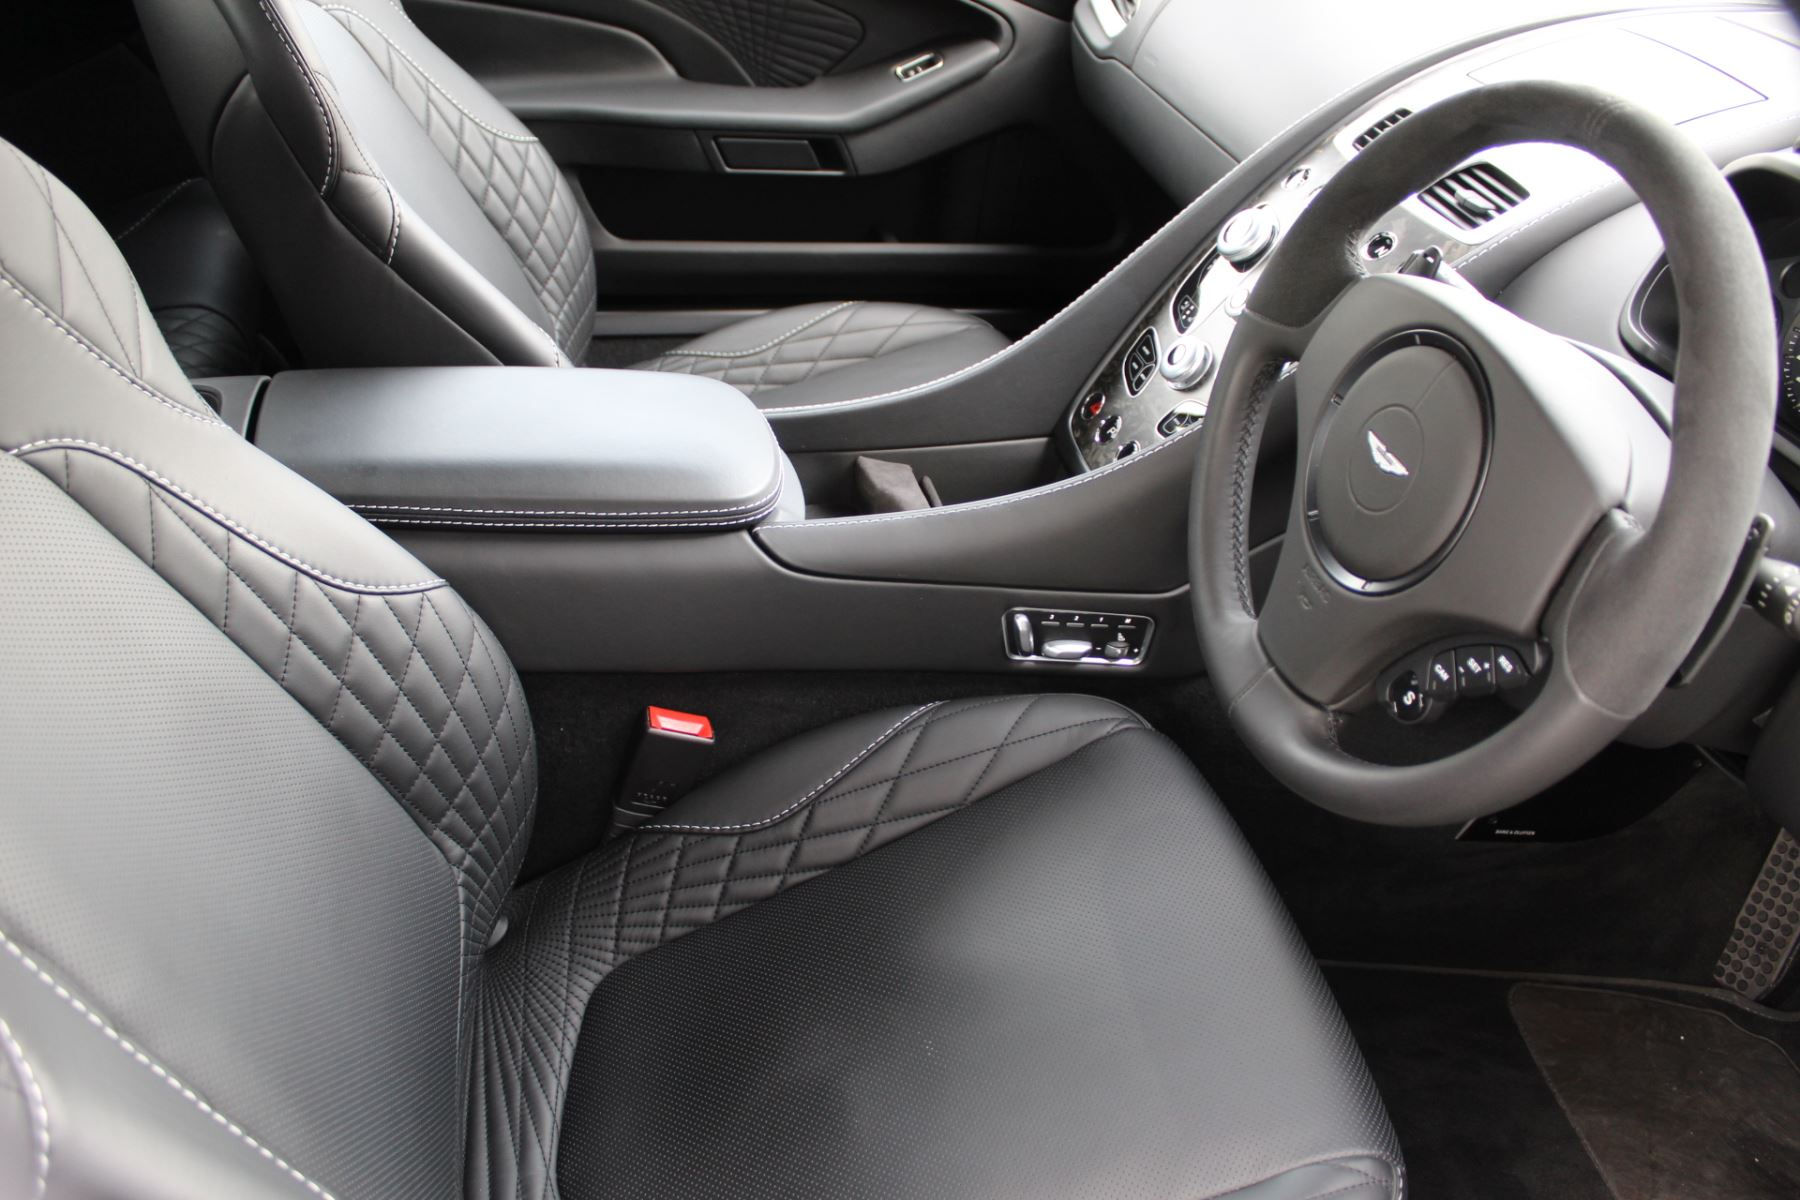 Aston Martin Vanquish S Volante V12 [595] S 2dr Volante Touchtronic image 11